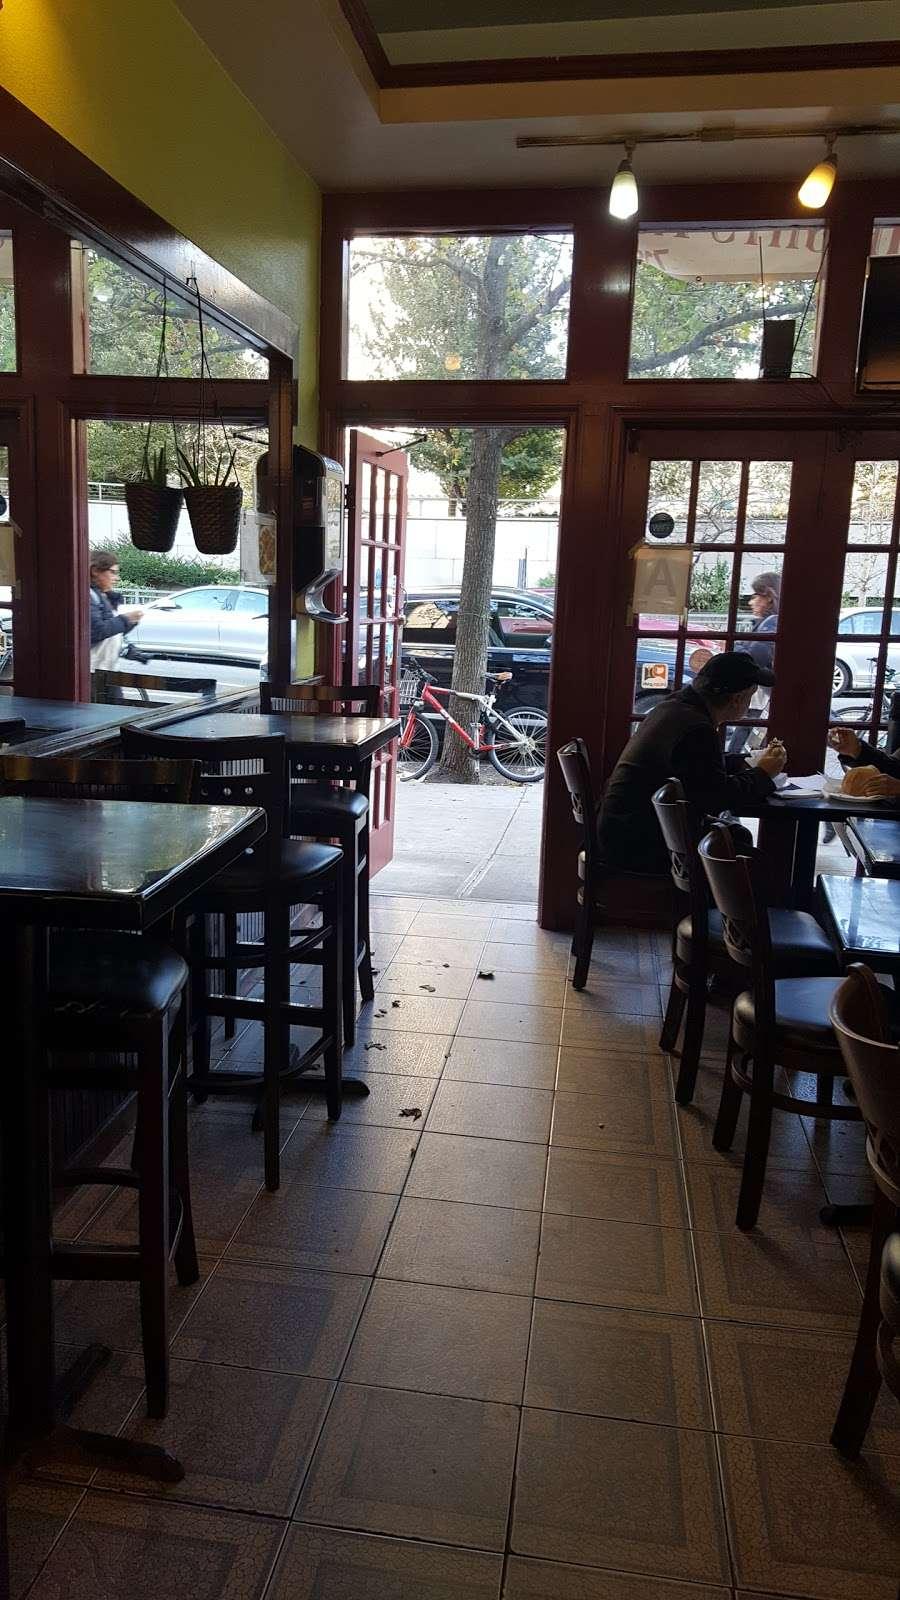 Heights Falafel - restaurant  | Photo 7 of 10 | Address: 78 Henry St, Brooklyn, NY 11201, USA | Phone: (718) 488-0808